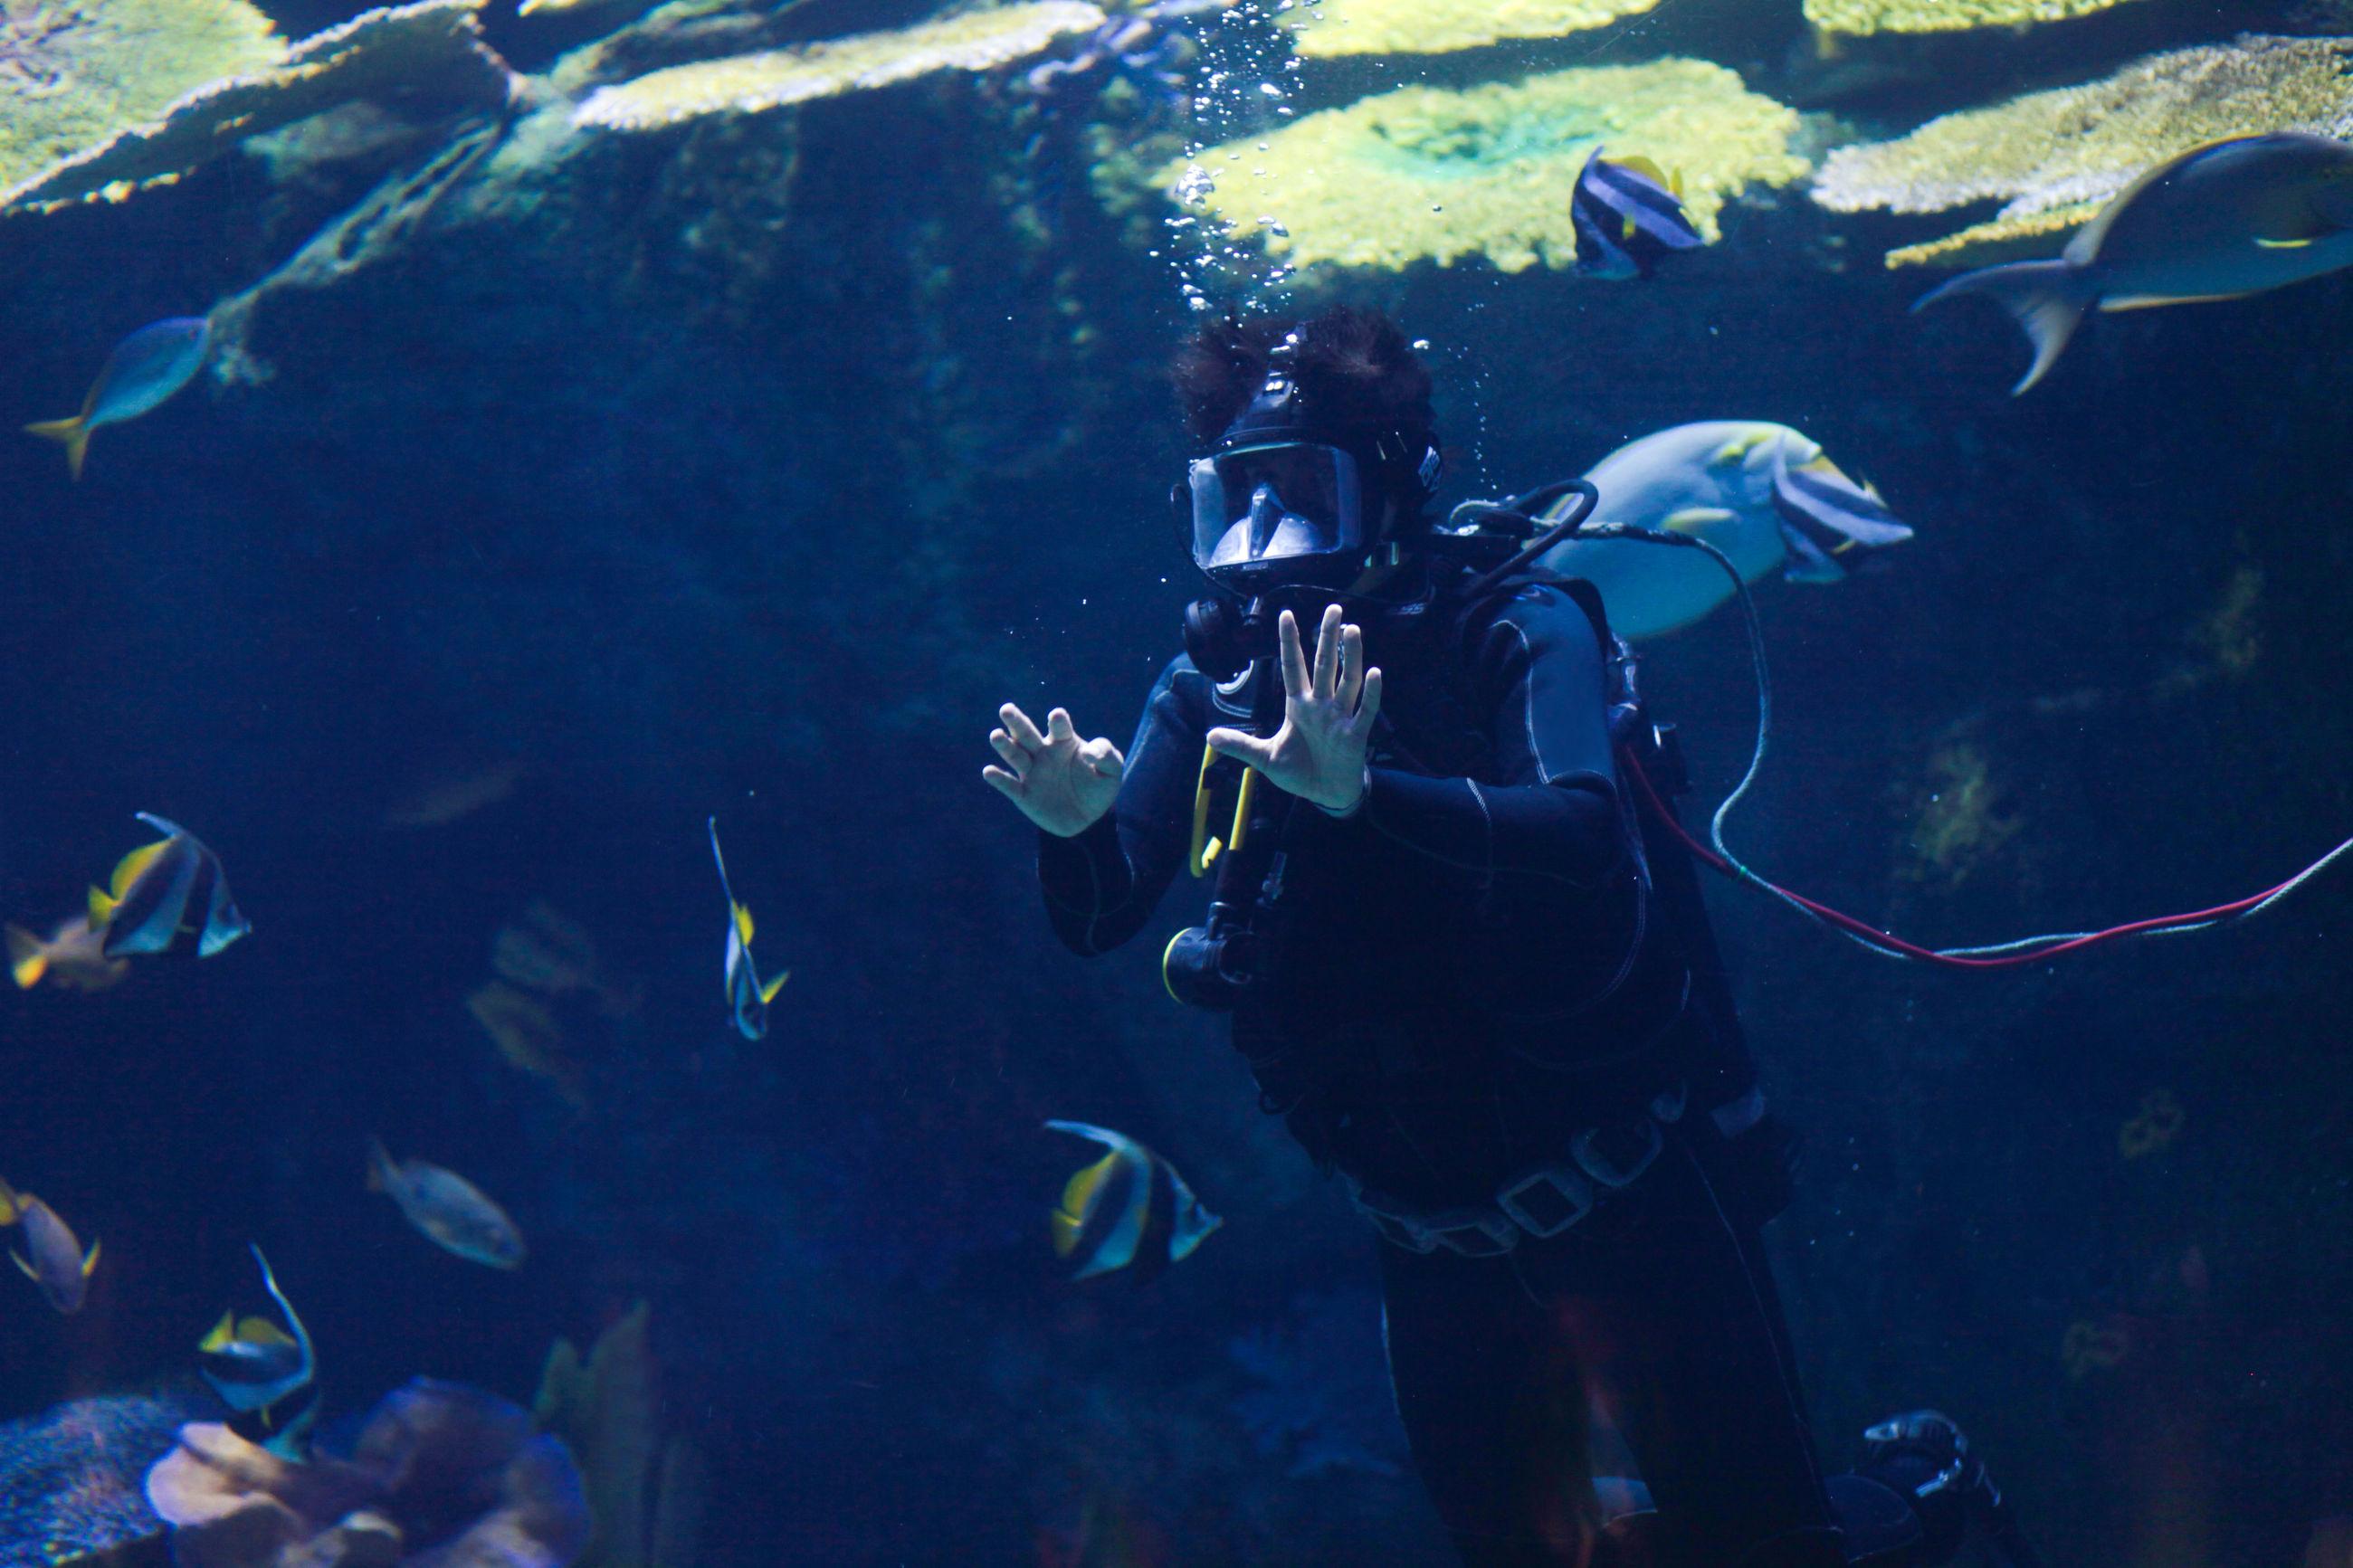 Man swimming undersea